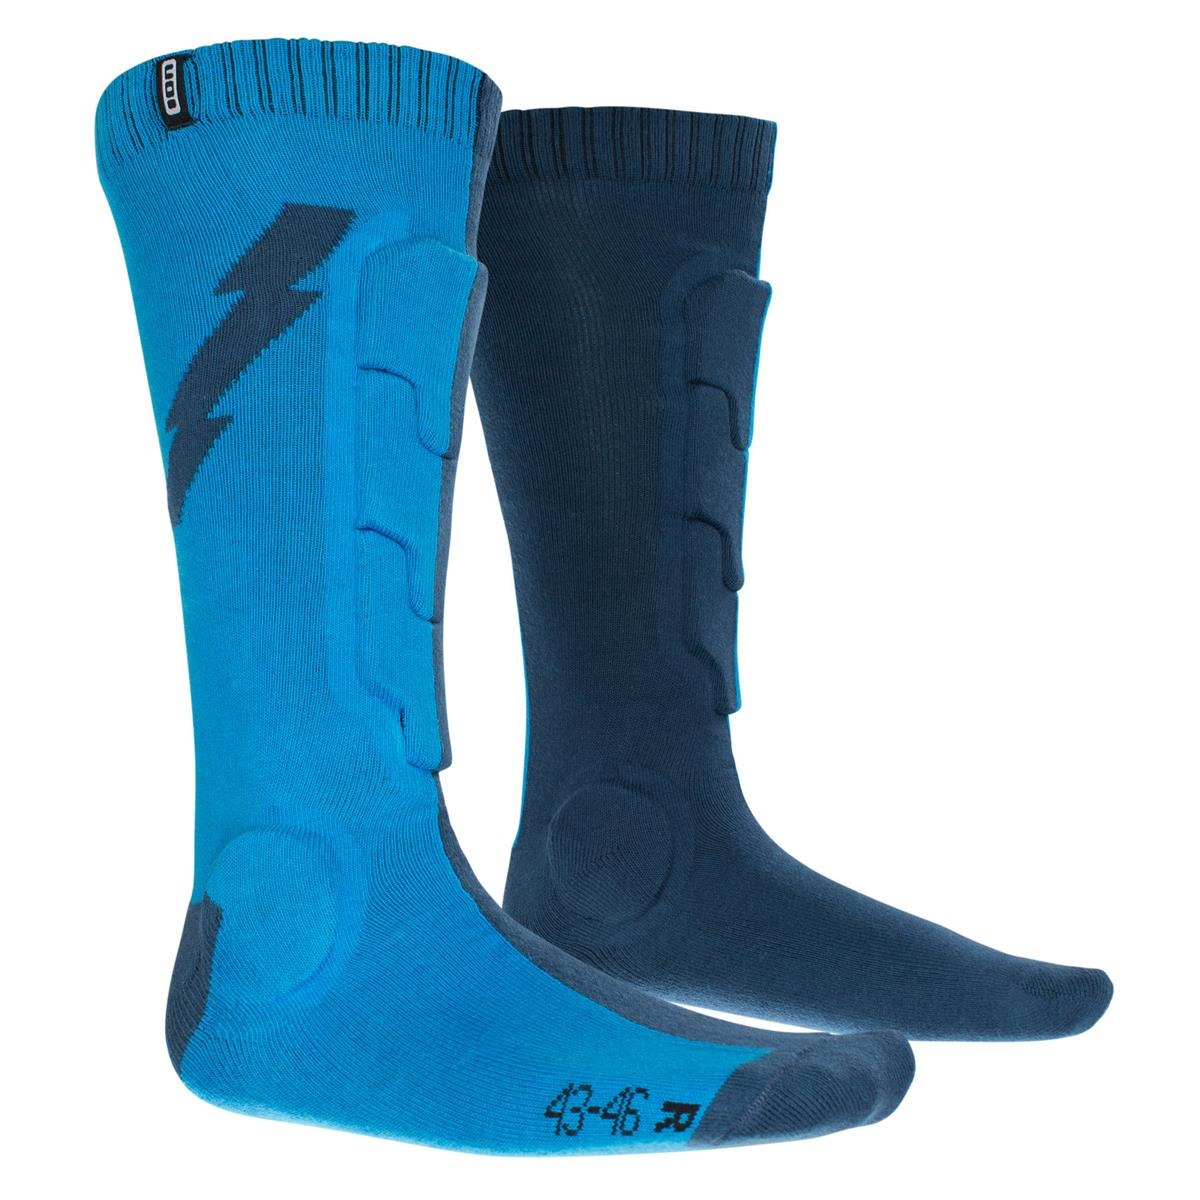 ION Bike Socken BD-2.0 Ocean Blau